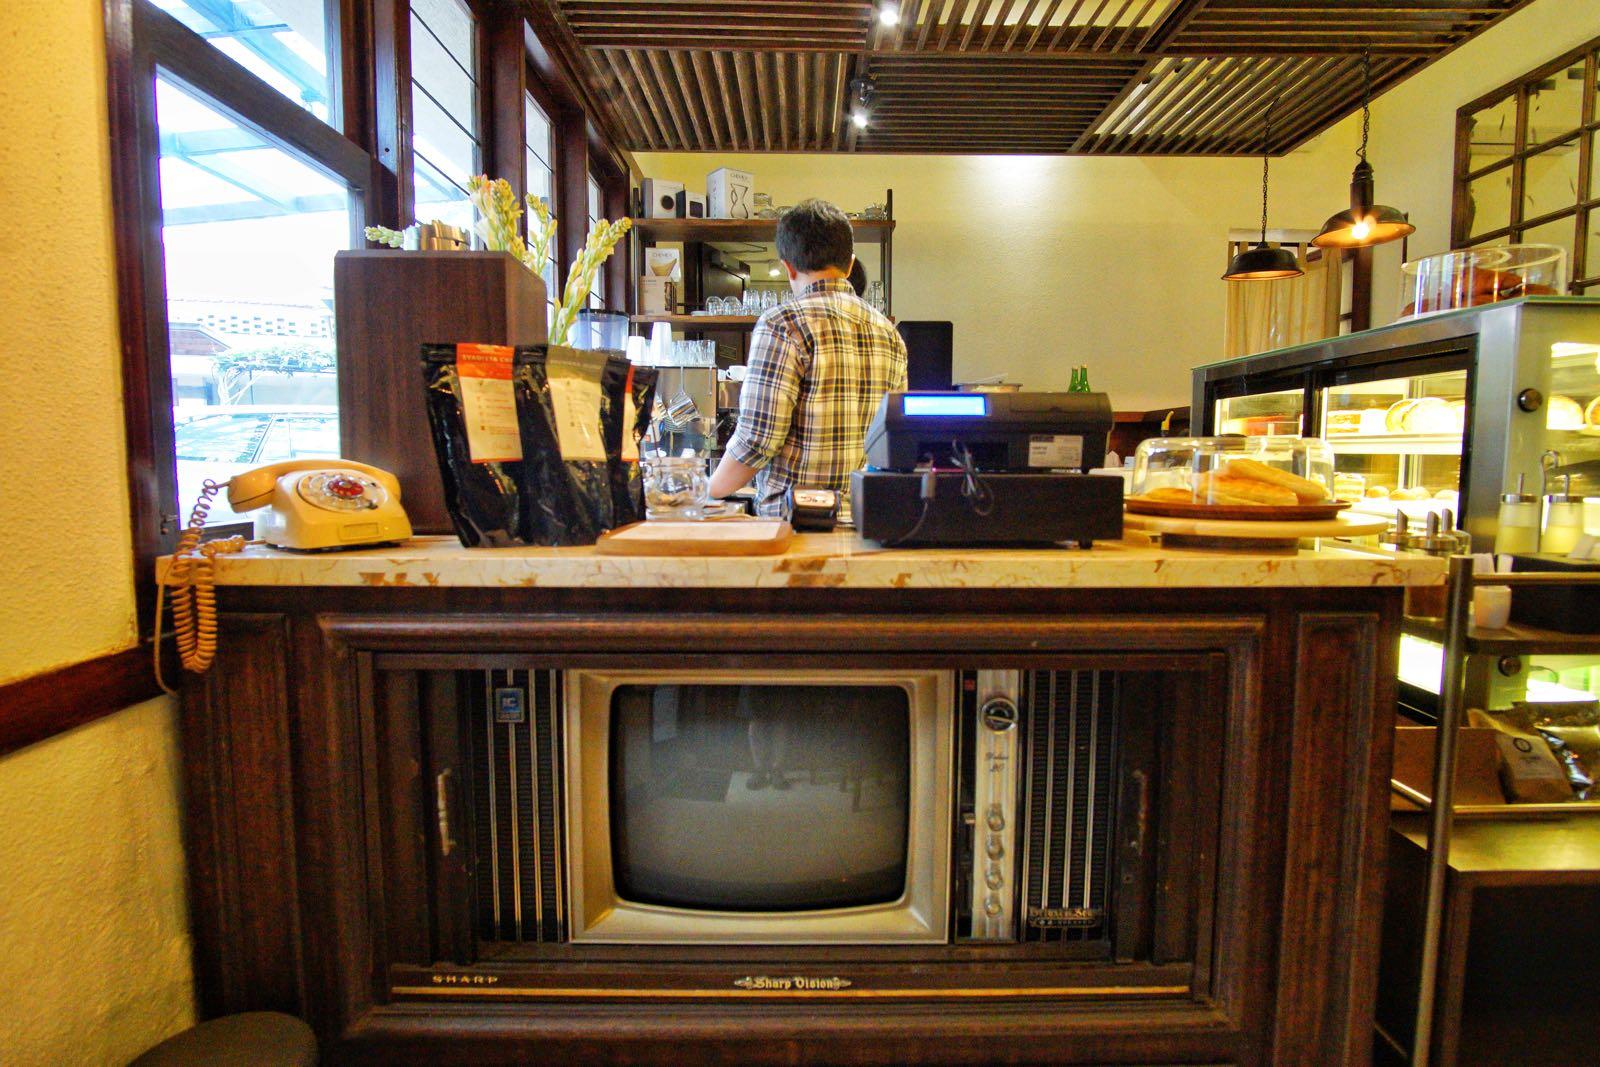 Kamar Tujuh old TV